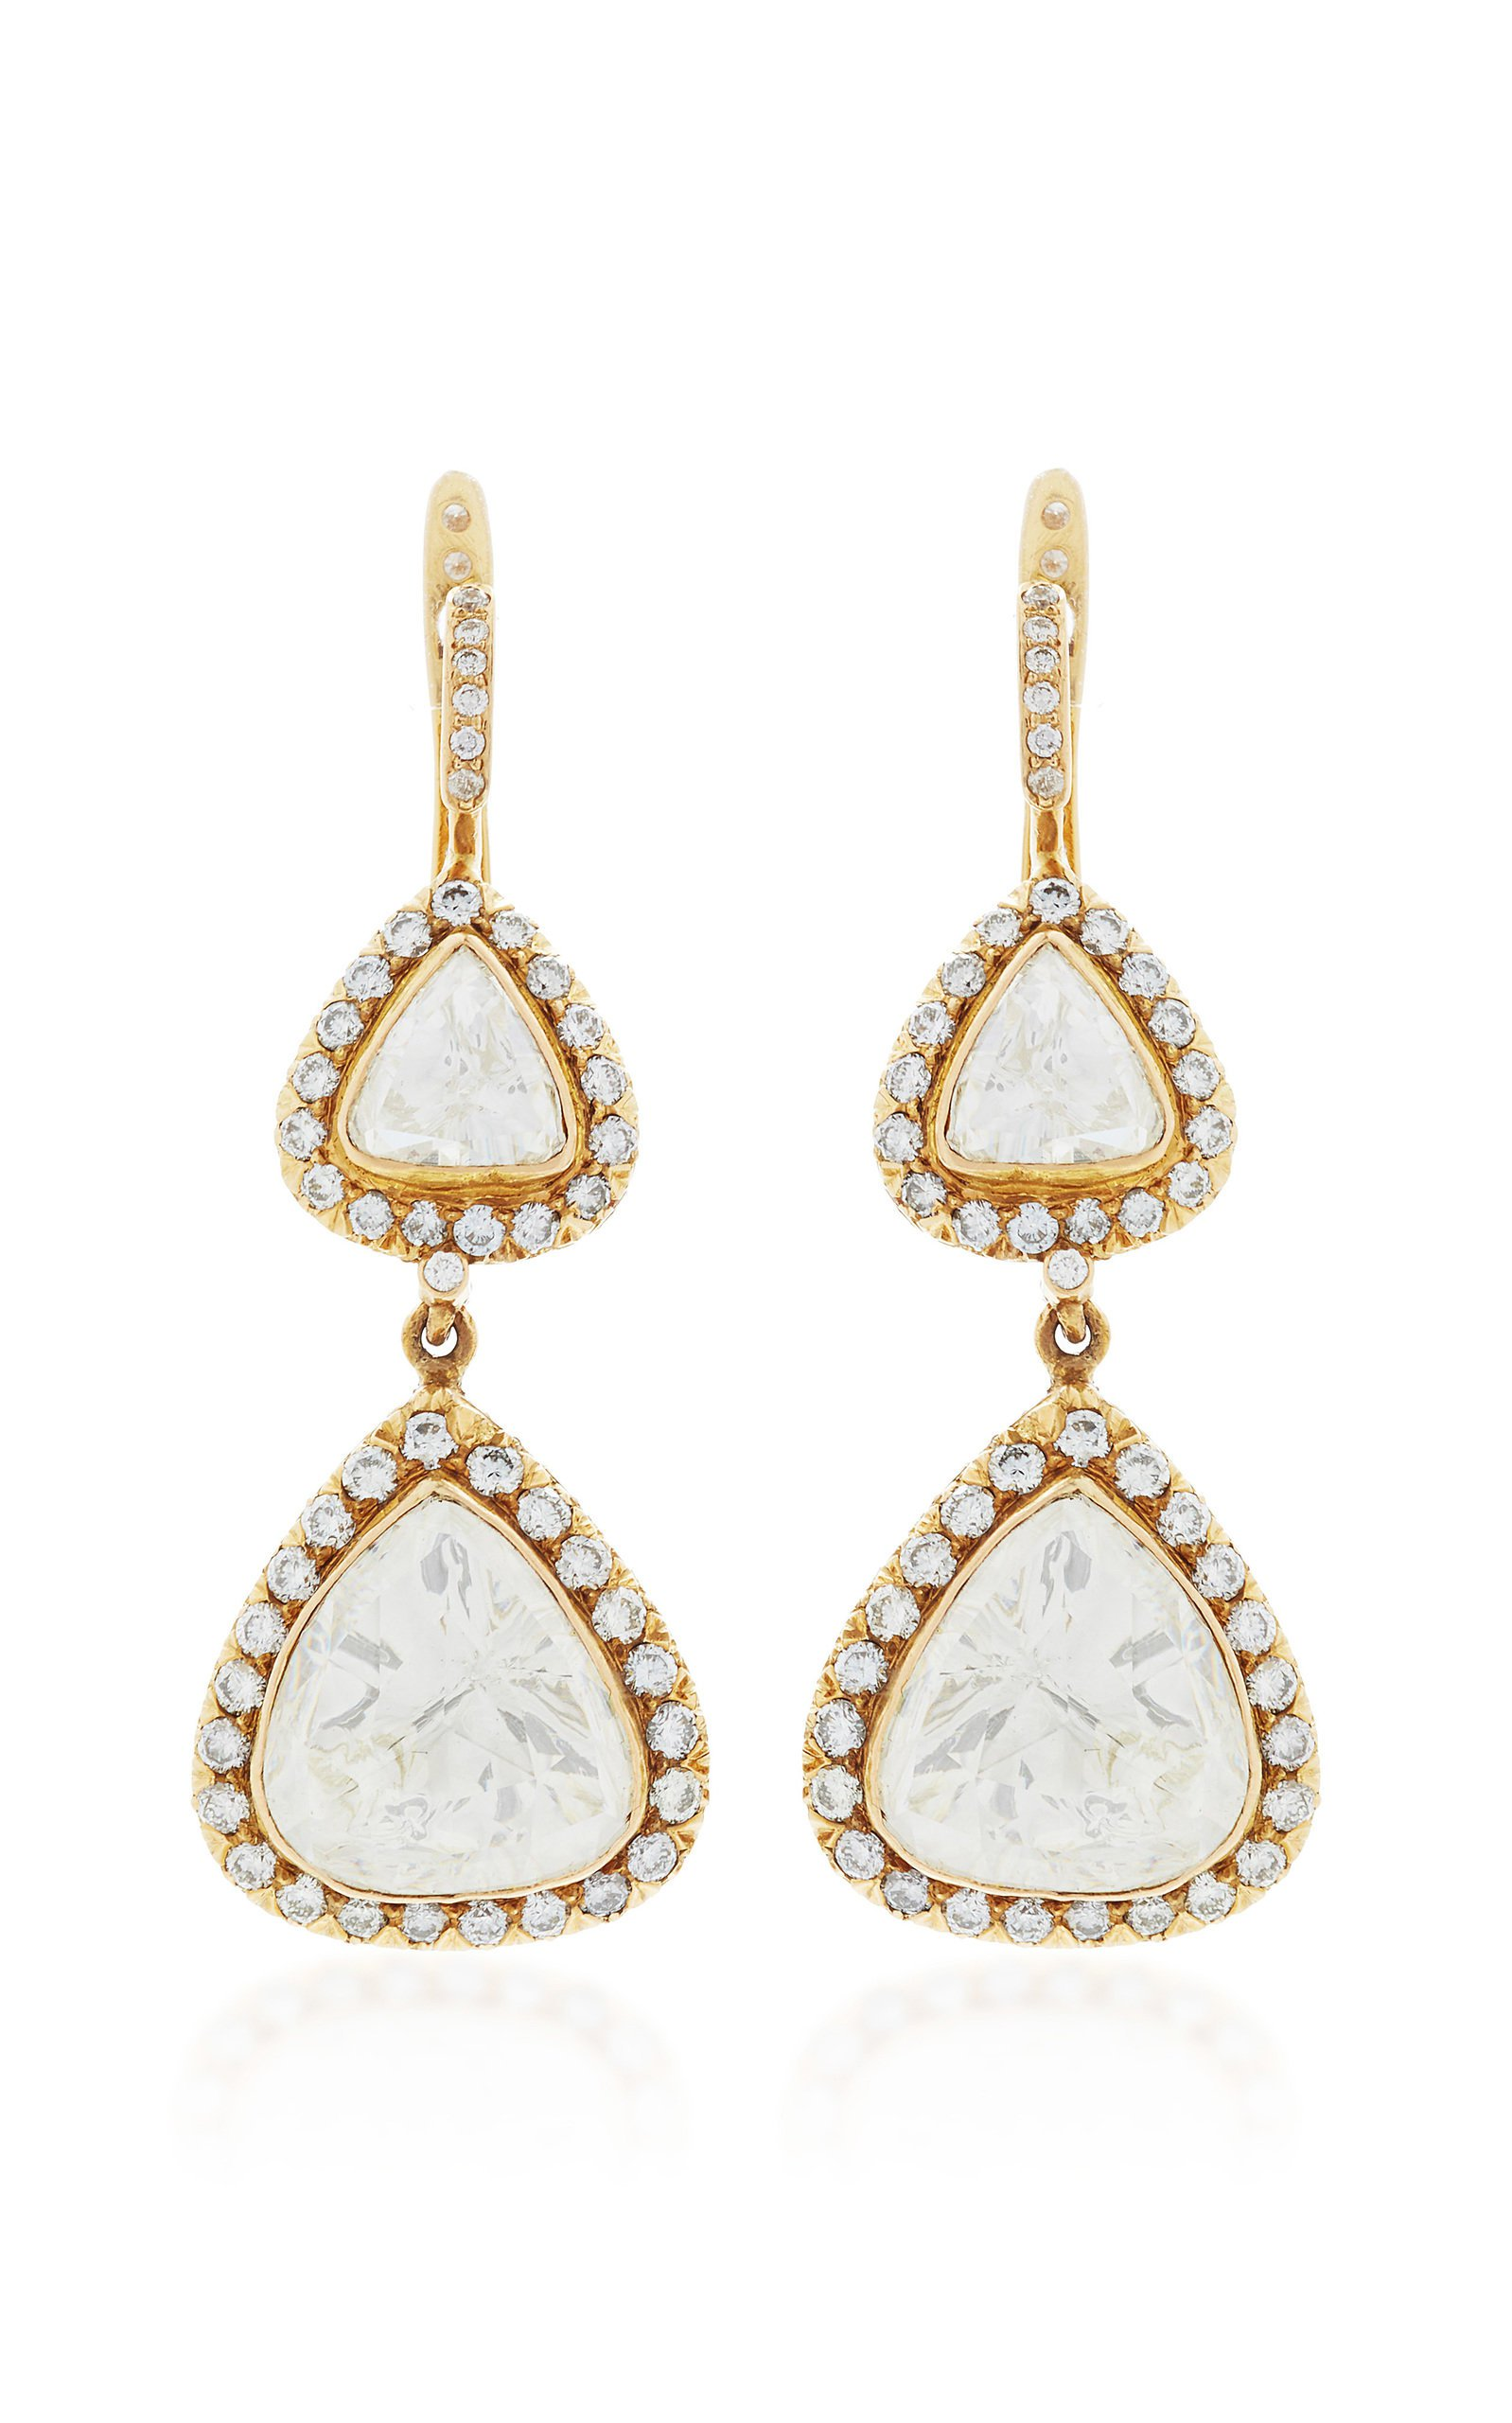 Sanjay Kasliwal 18k Gold and Diamond Royal Earrings